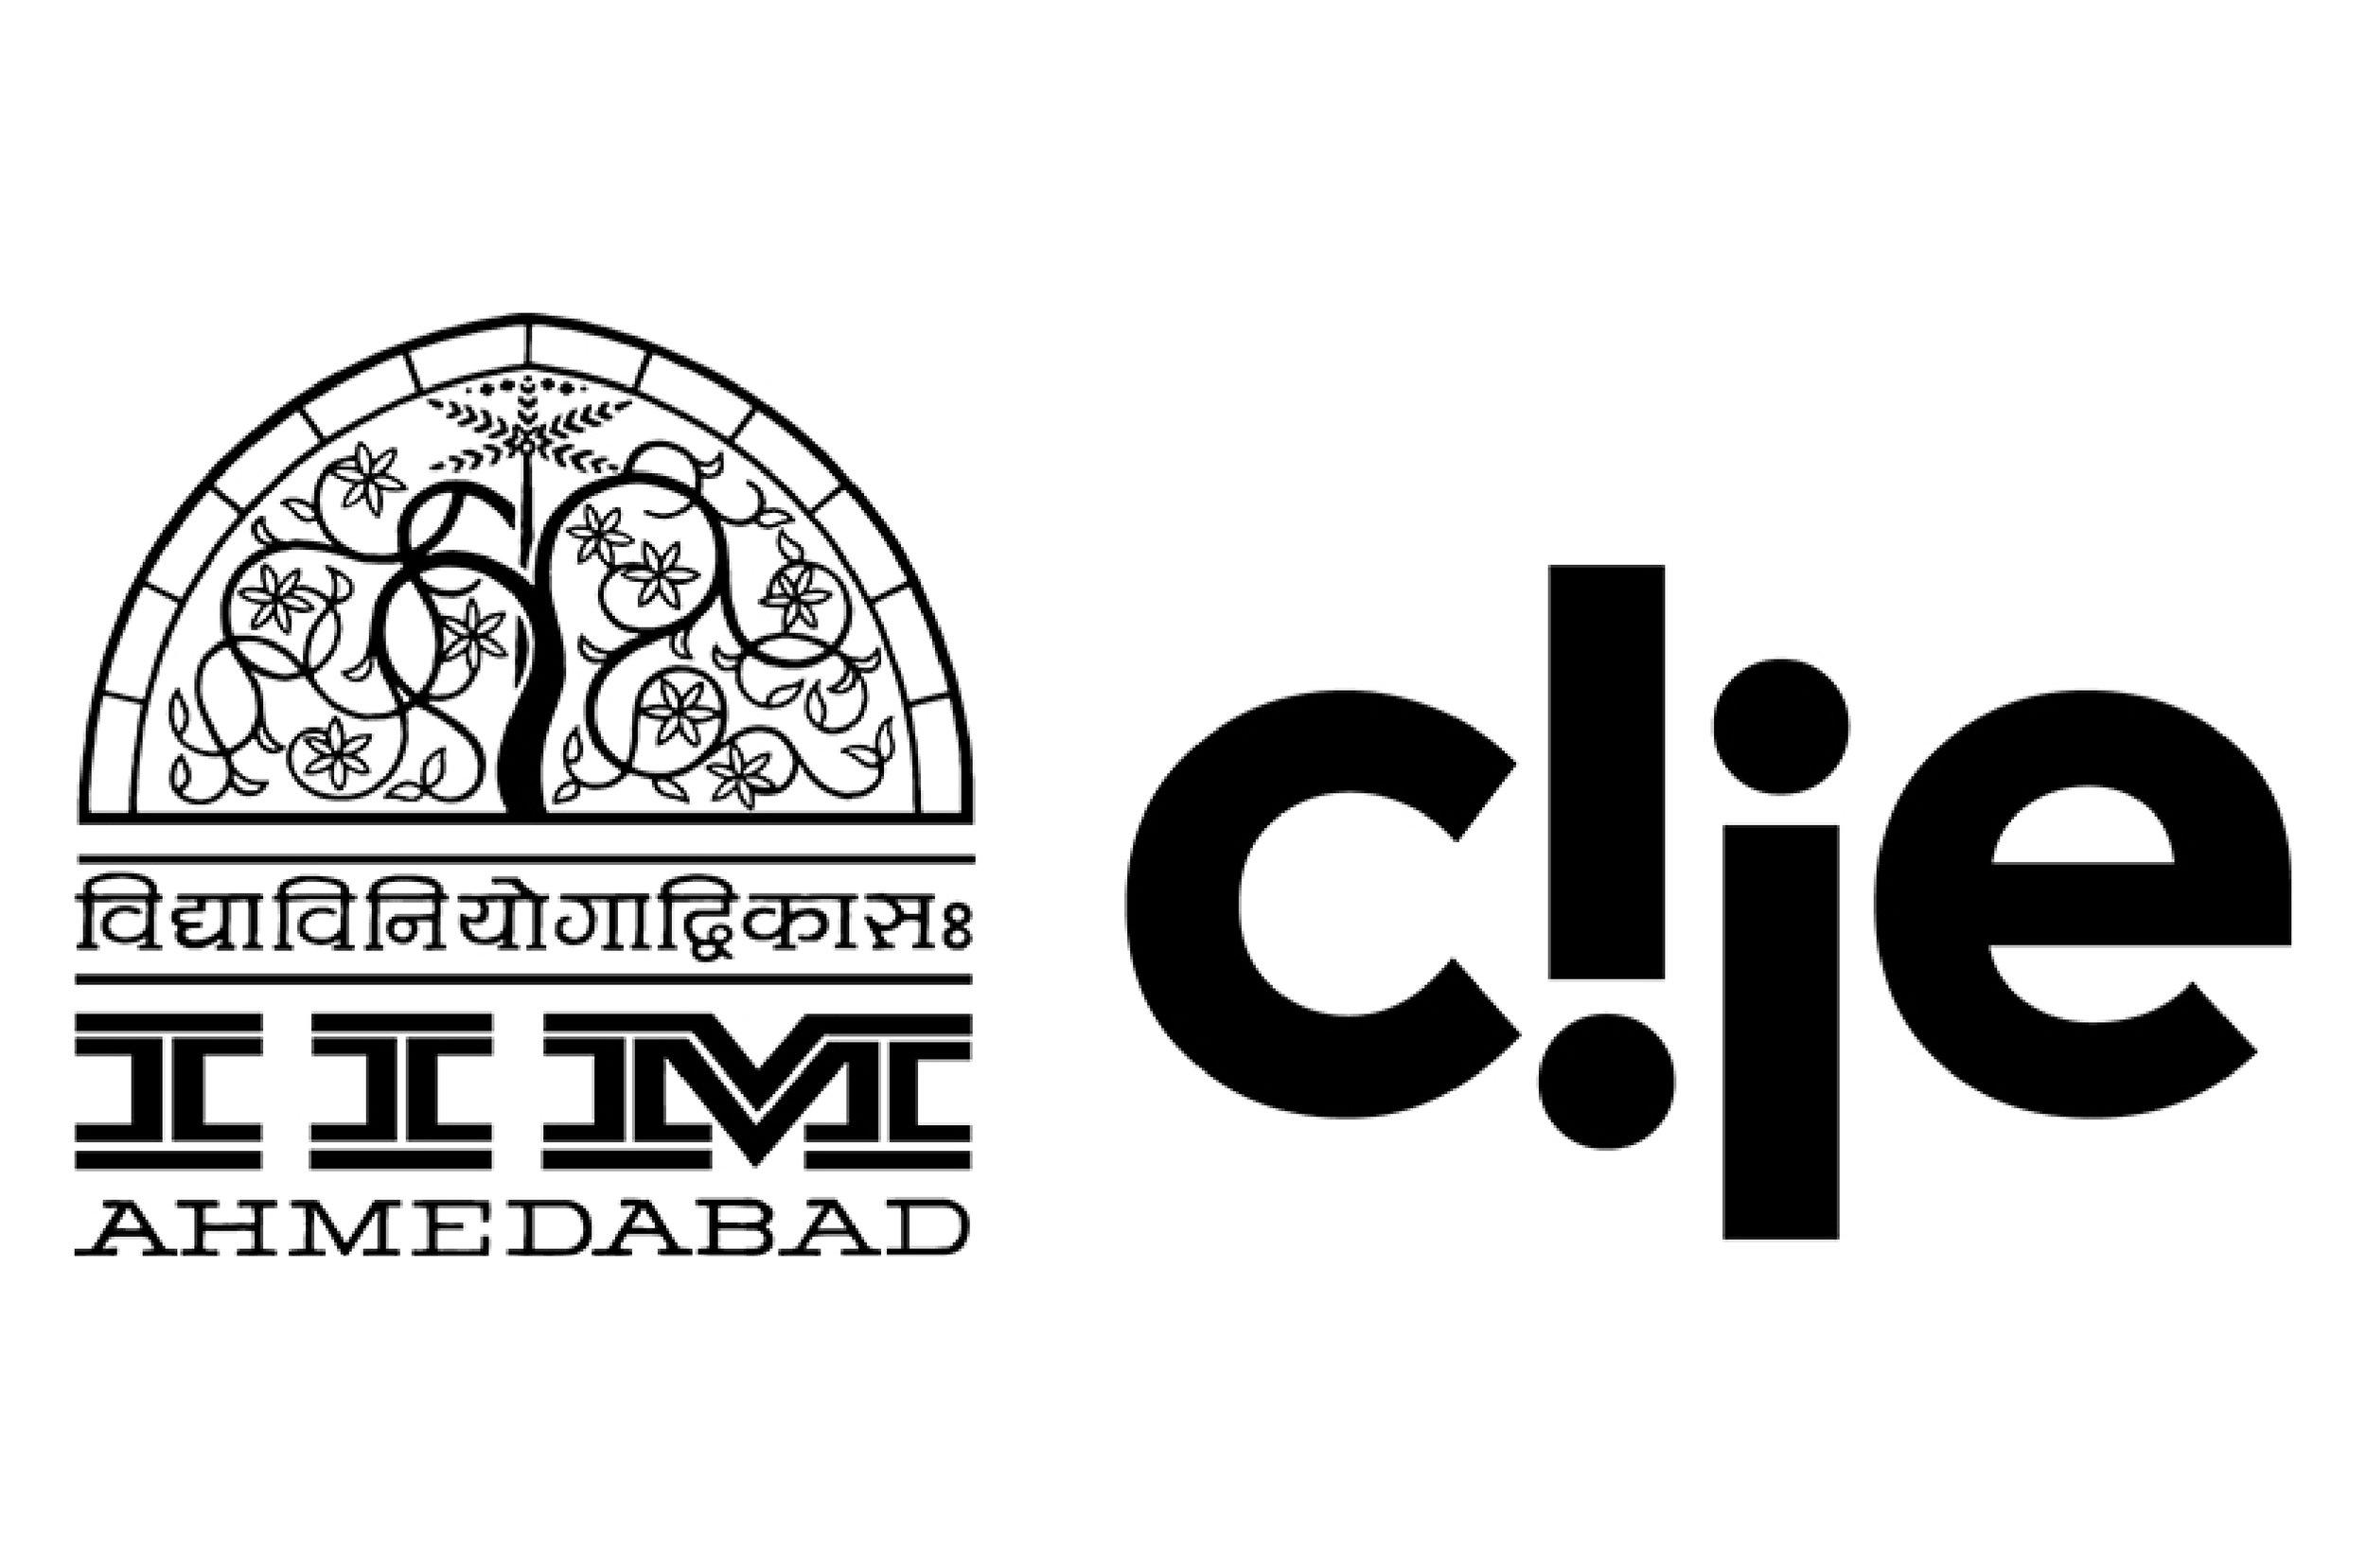 Centre for Innovation Incubation and Entrepreneurship (CIIE)_Elephant Design_Pune, Singapore.jpg